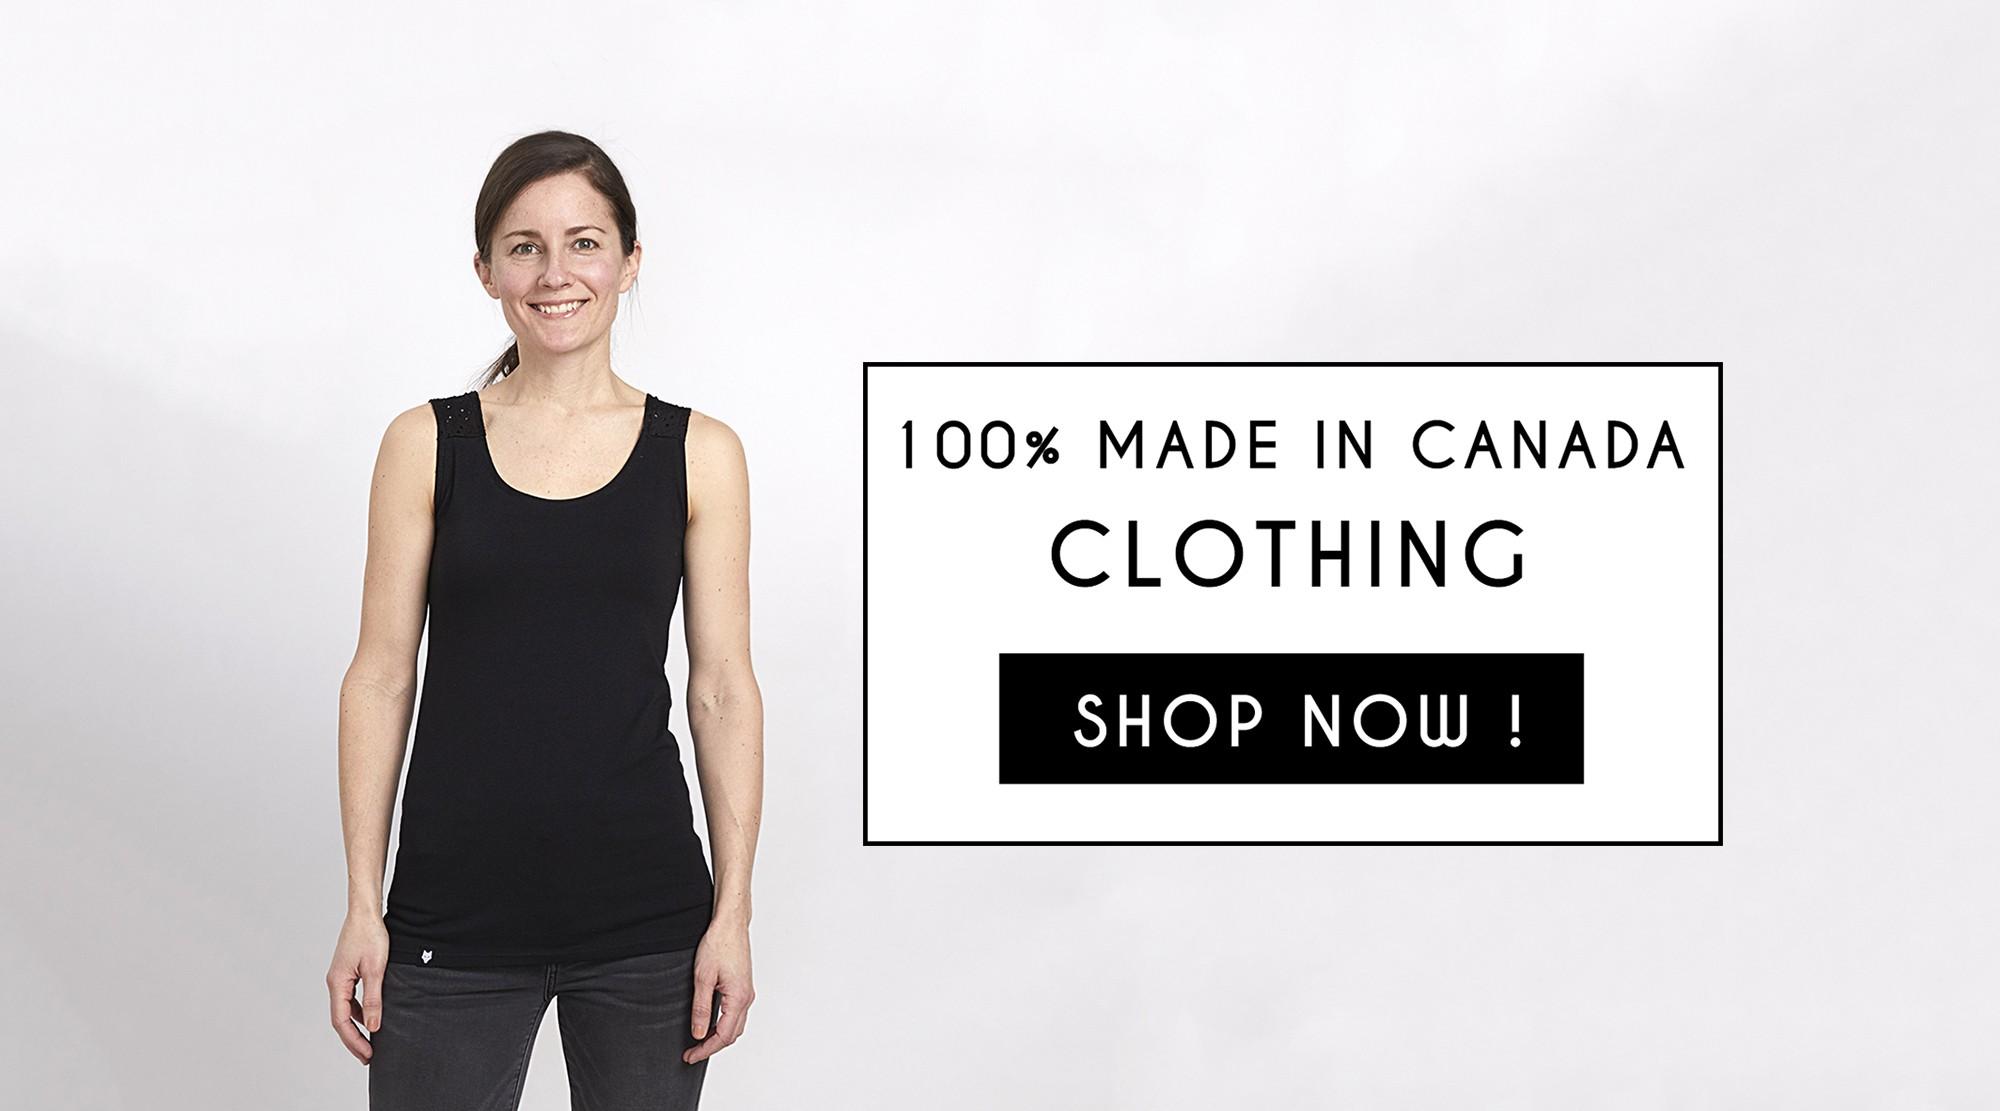 Chandaildeloup.com Clothing